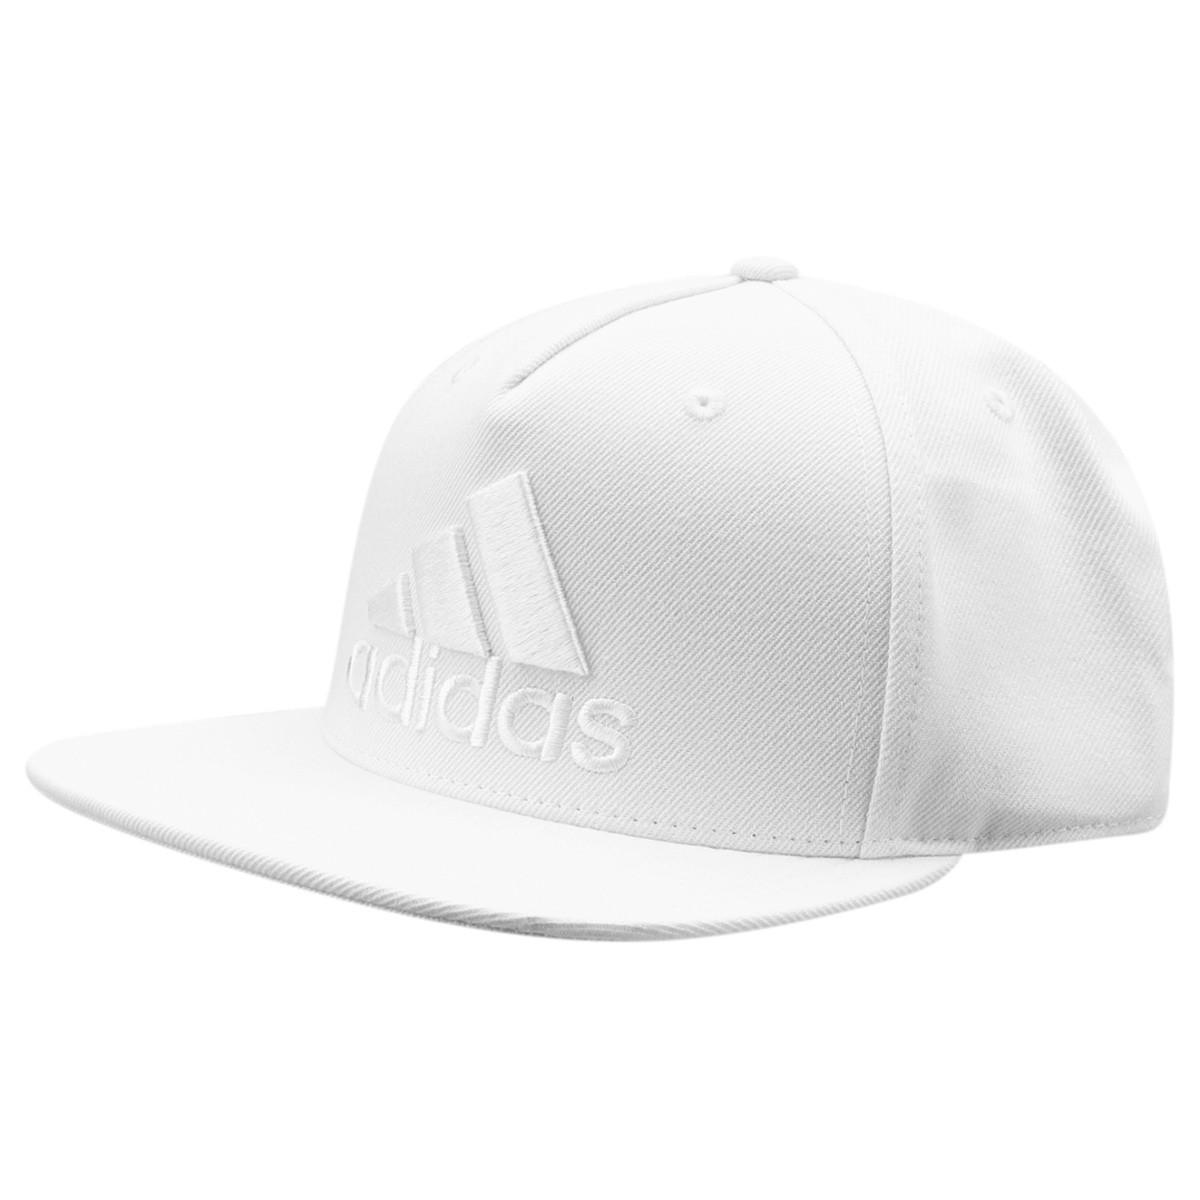 5e2bcdf555bb5 Bone Adidas Flat Cap Logo